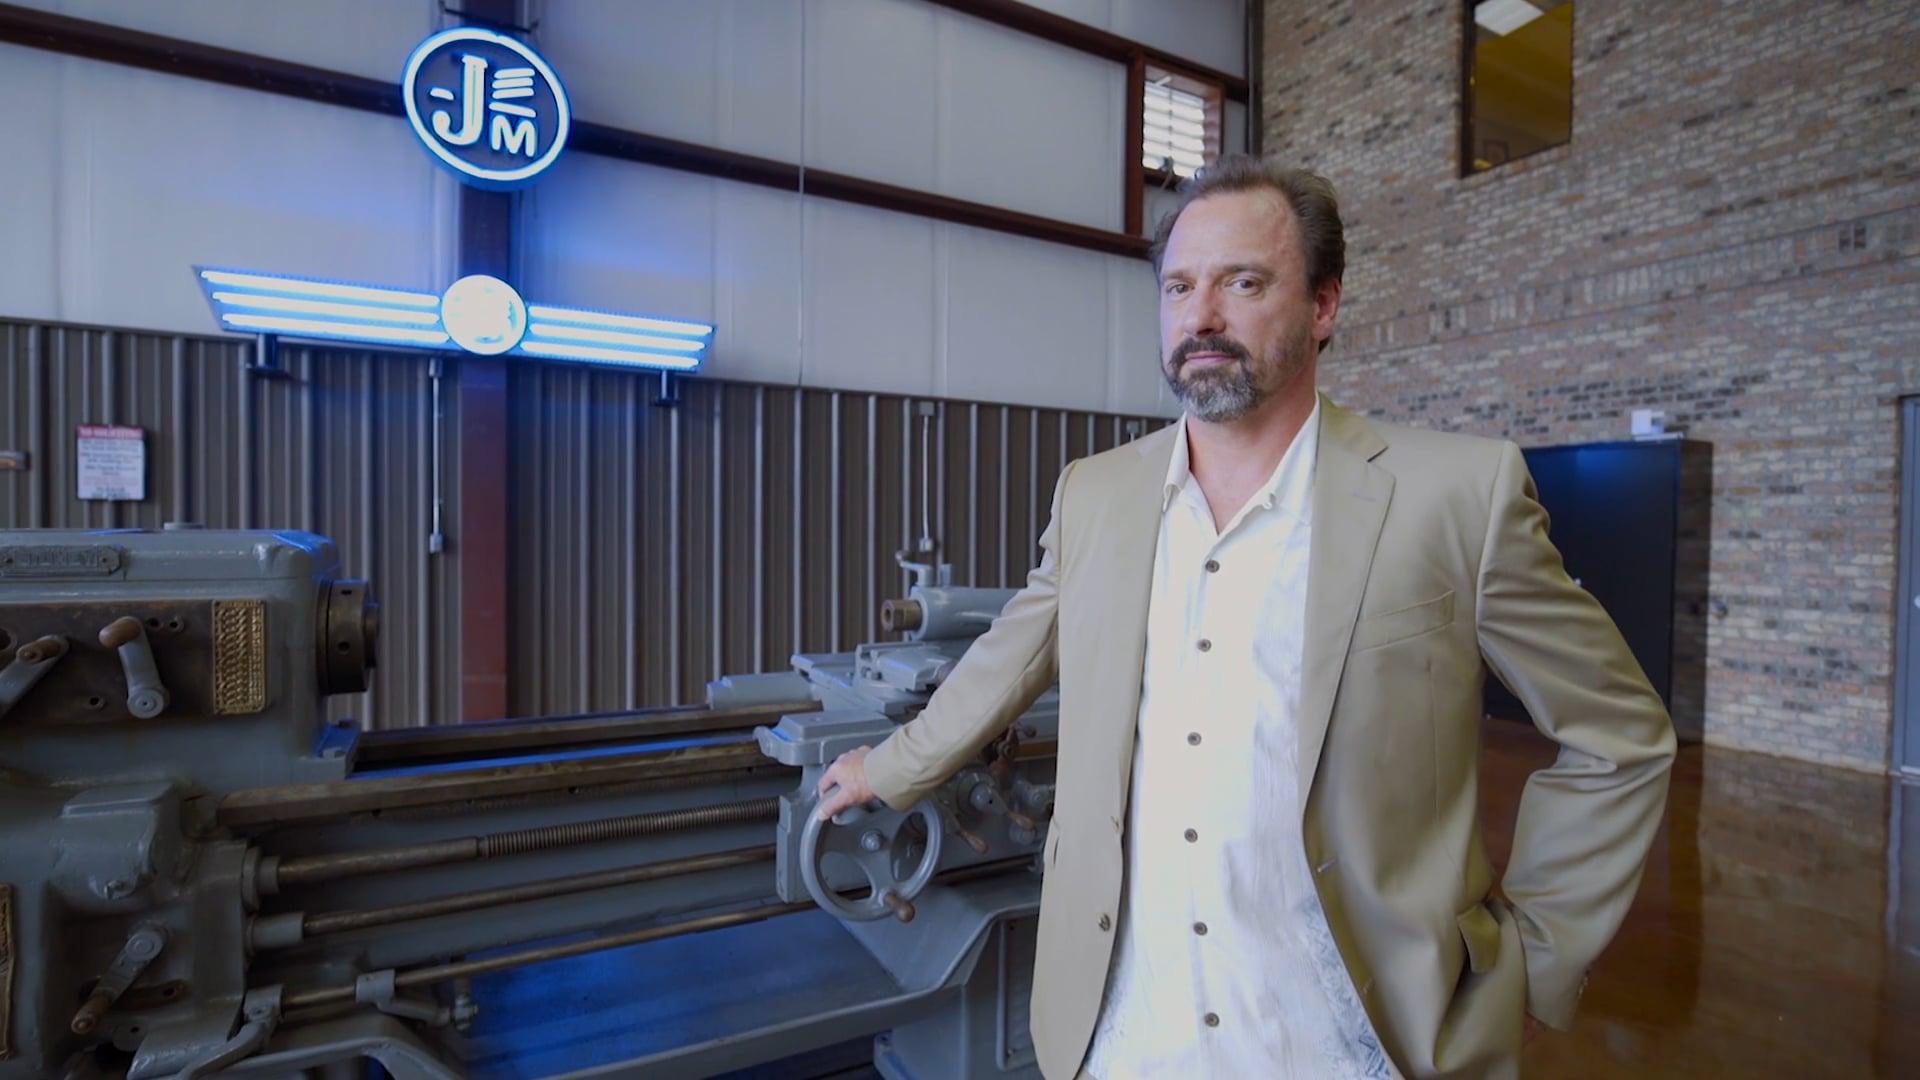 Jeffrey Machines